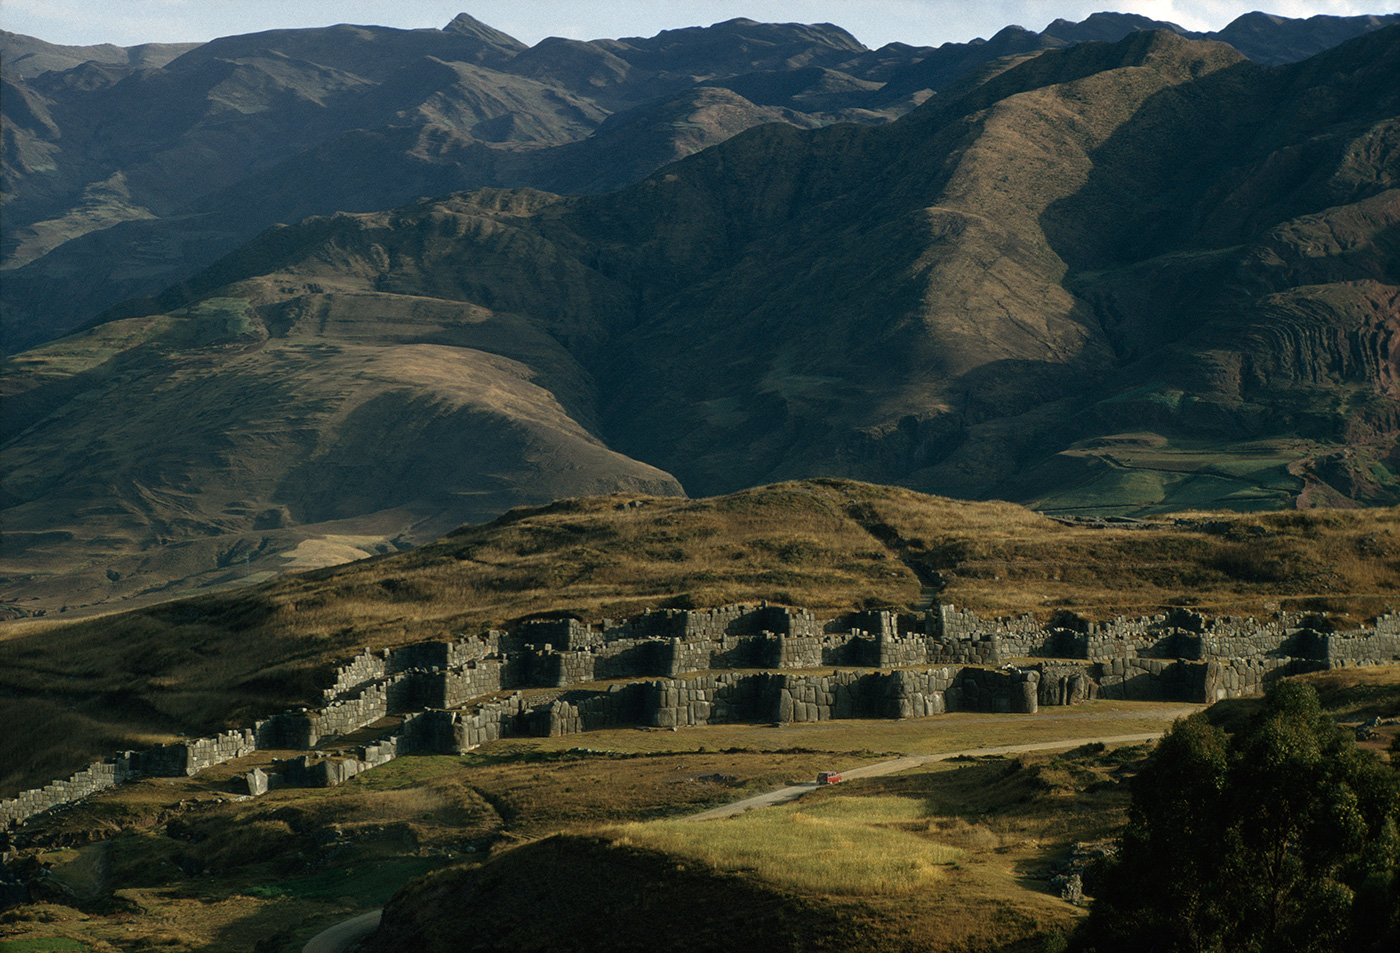 Sacsahuaman Fortress, near Cuzco, Peru.